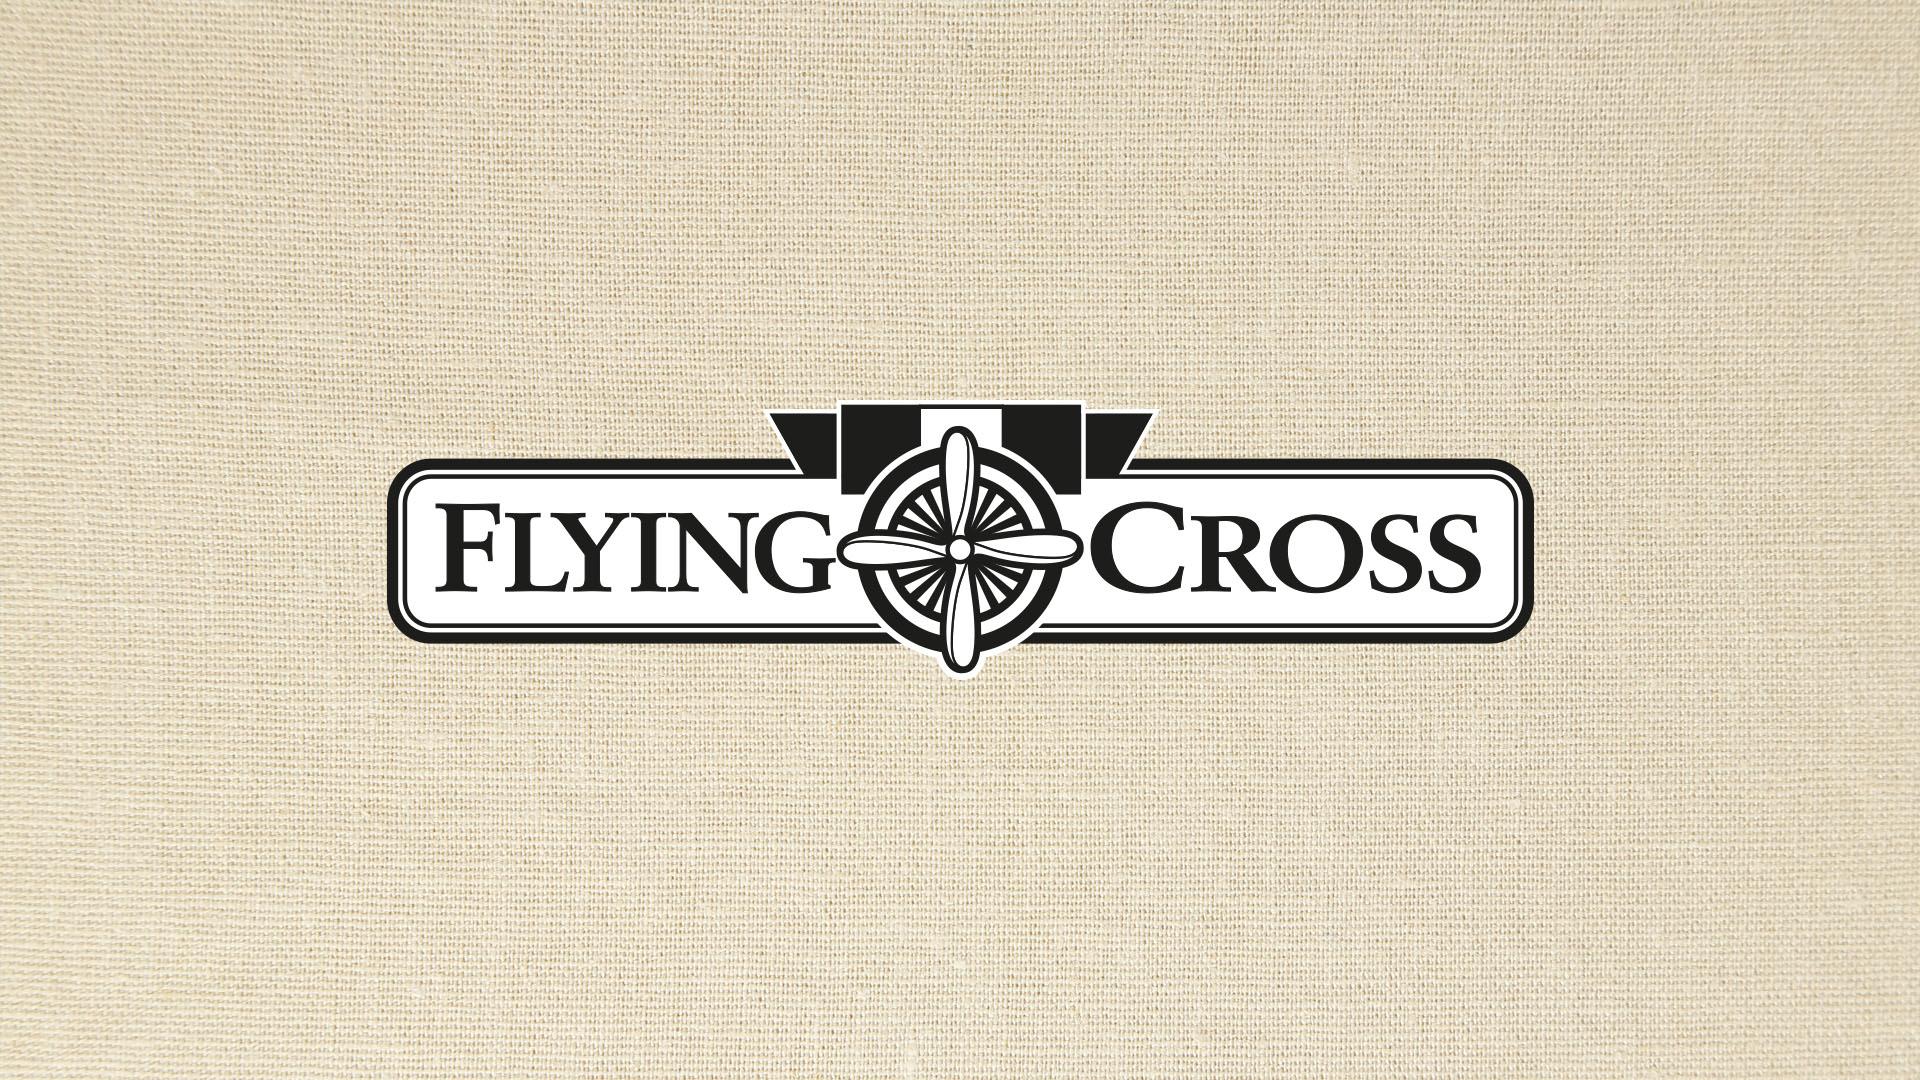 FLYING CROSS BRAND IDENTITY & INSTORE DISPLAY